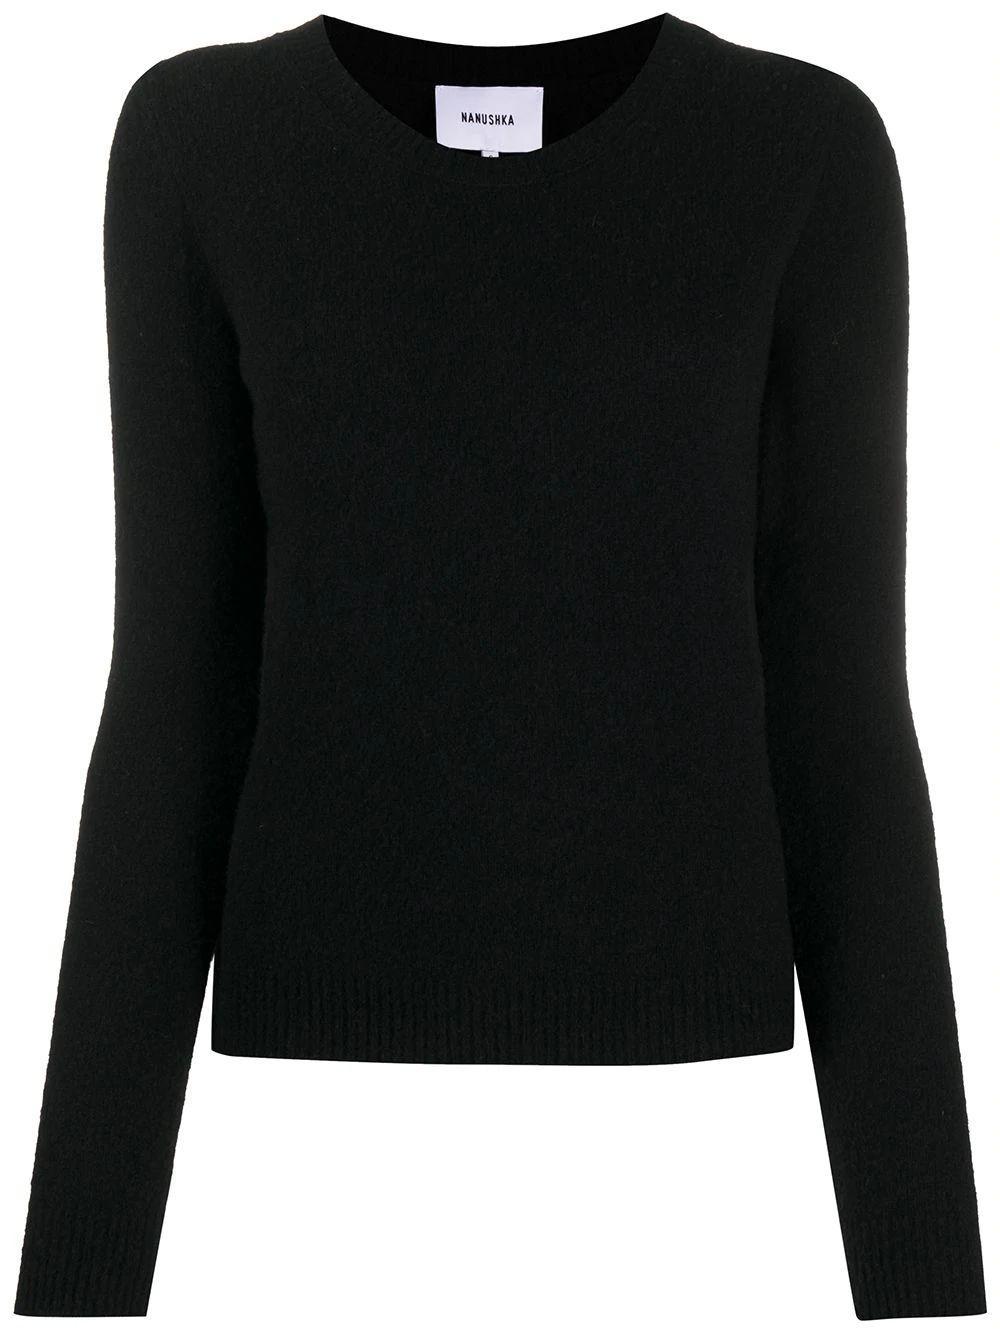 Rei Crew Neck Sweater Item # FWSW02899